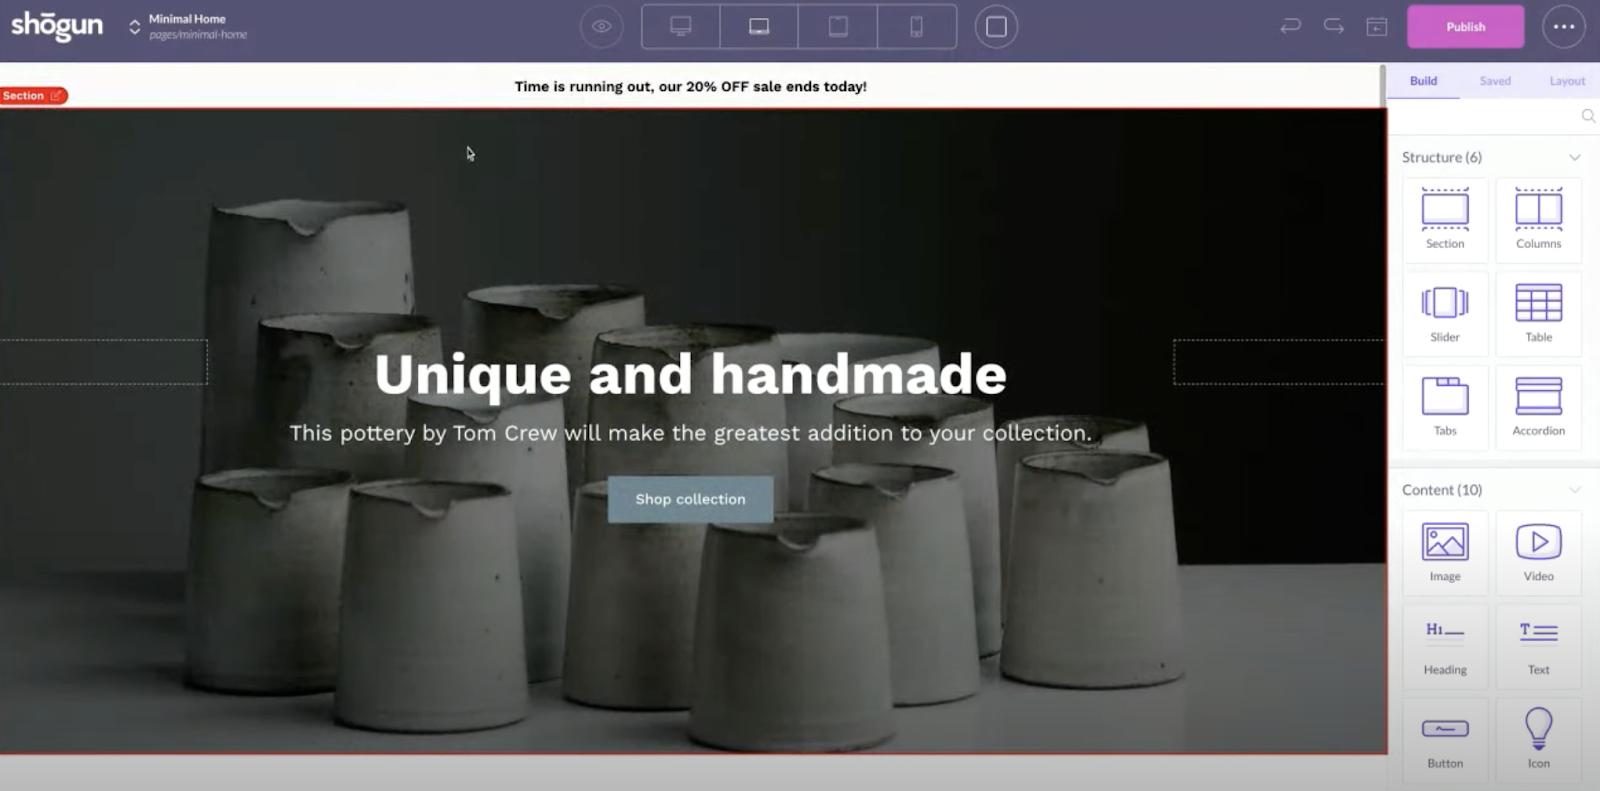 shogun page builder visual editor homepage template